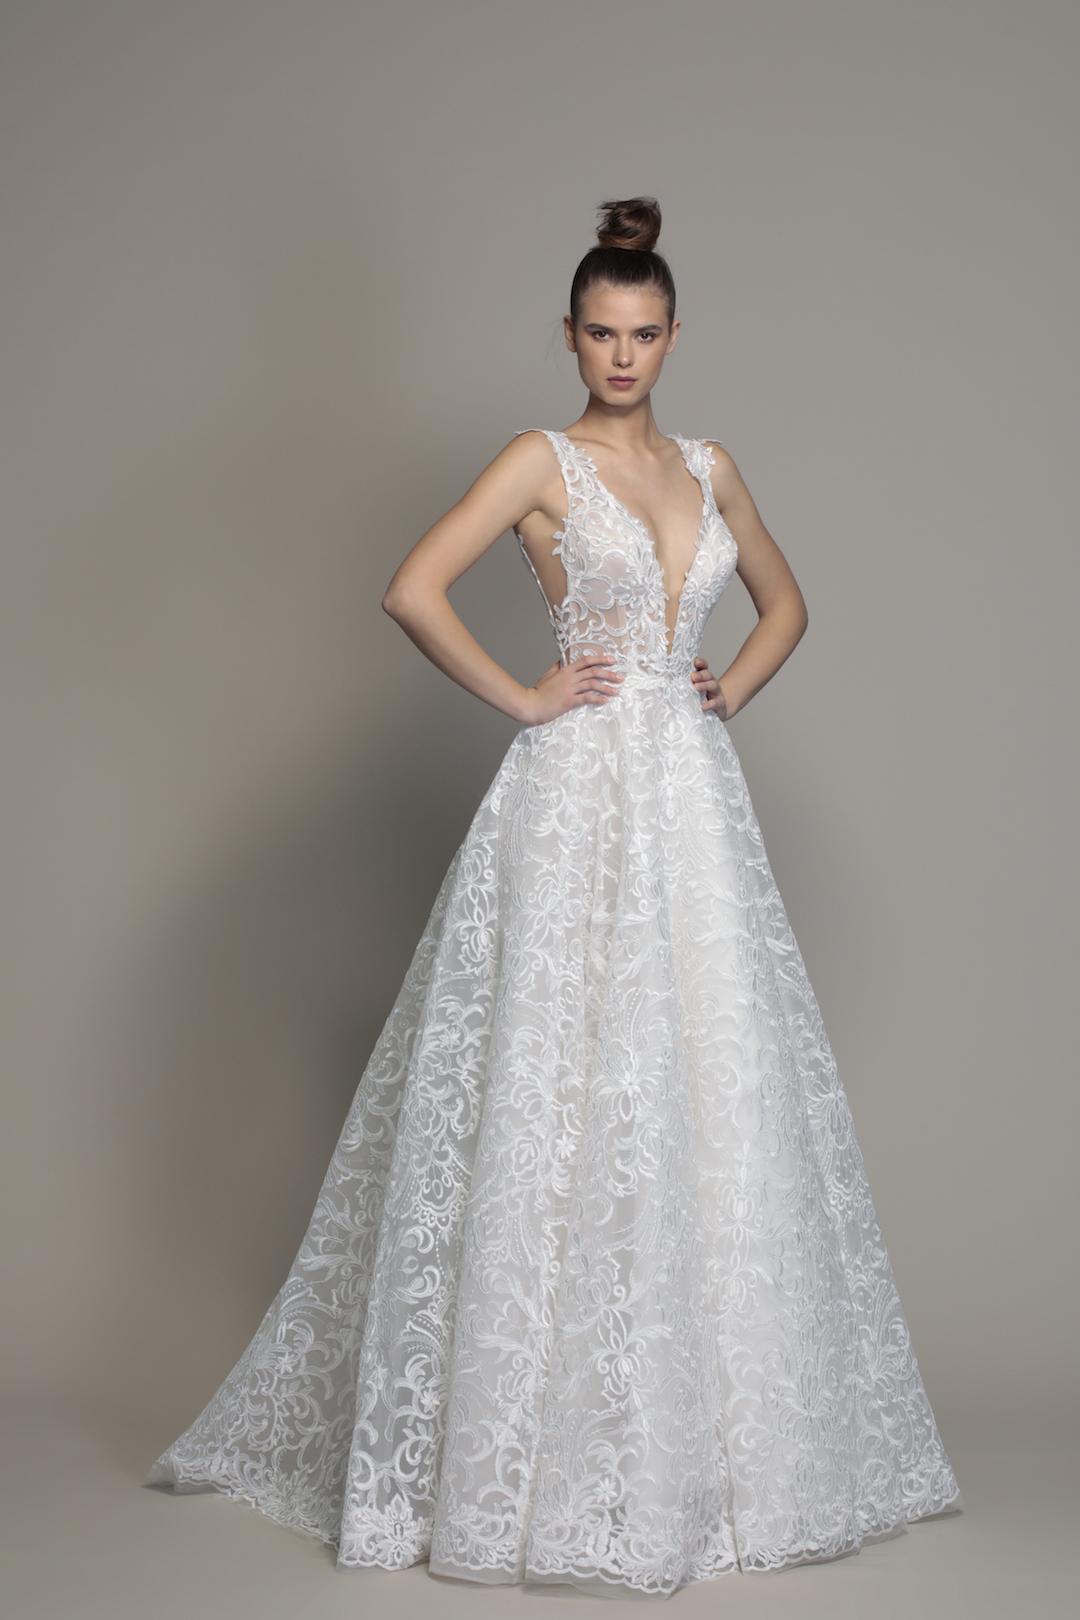 Wedding Dress Photos, Wedding Dresses Pictures - WeddingWire   Kleinfeld Bridal Wedding Dresses